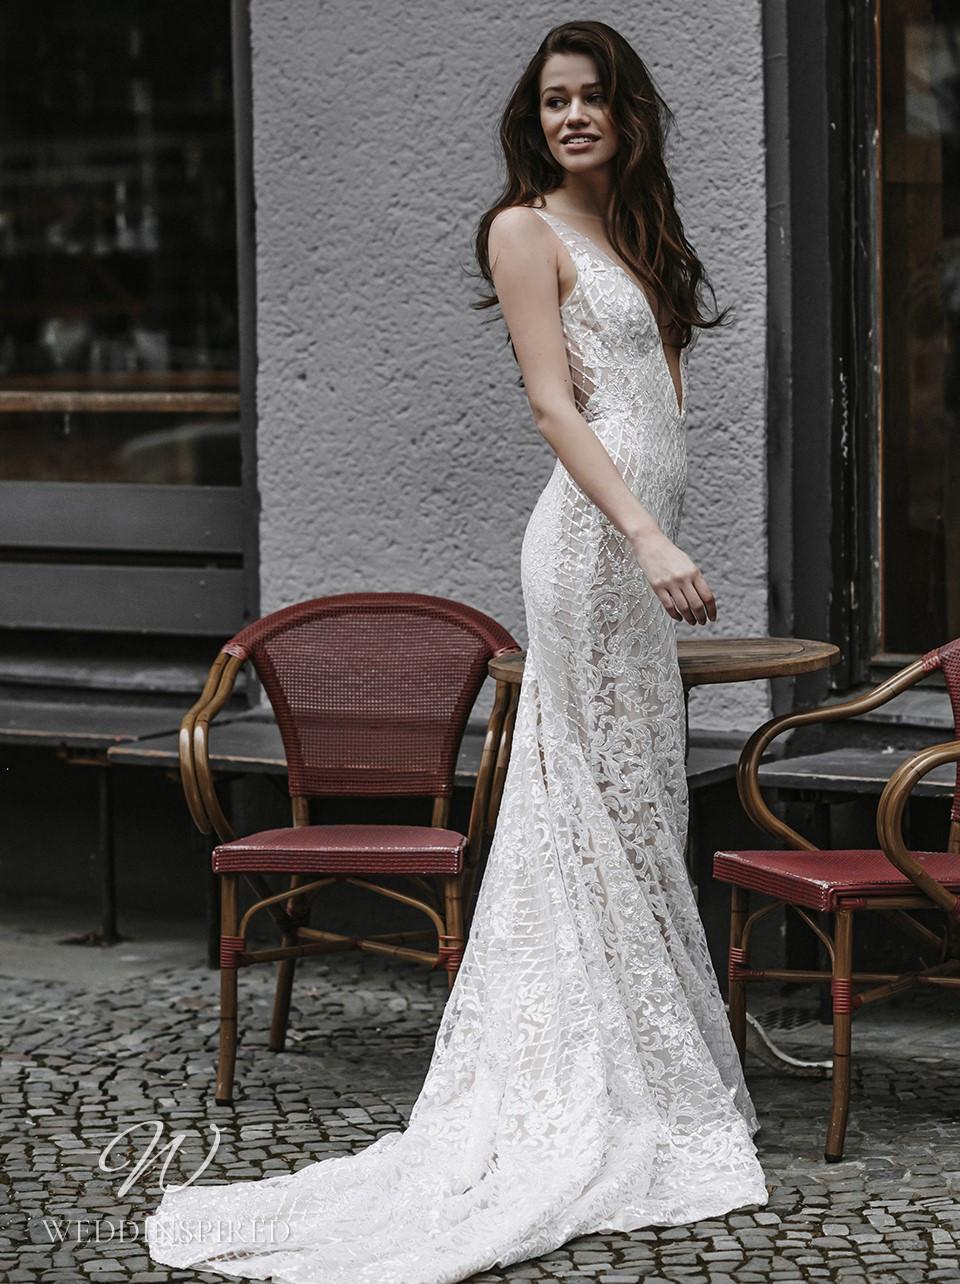 A Galia Lahav 2022 lace mermaid wedding dress with a v neck